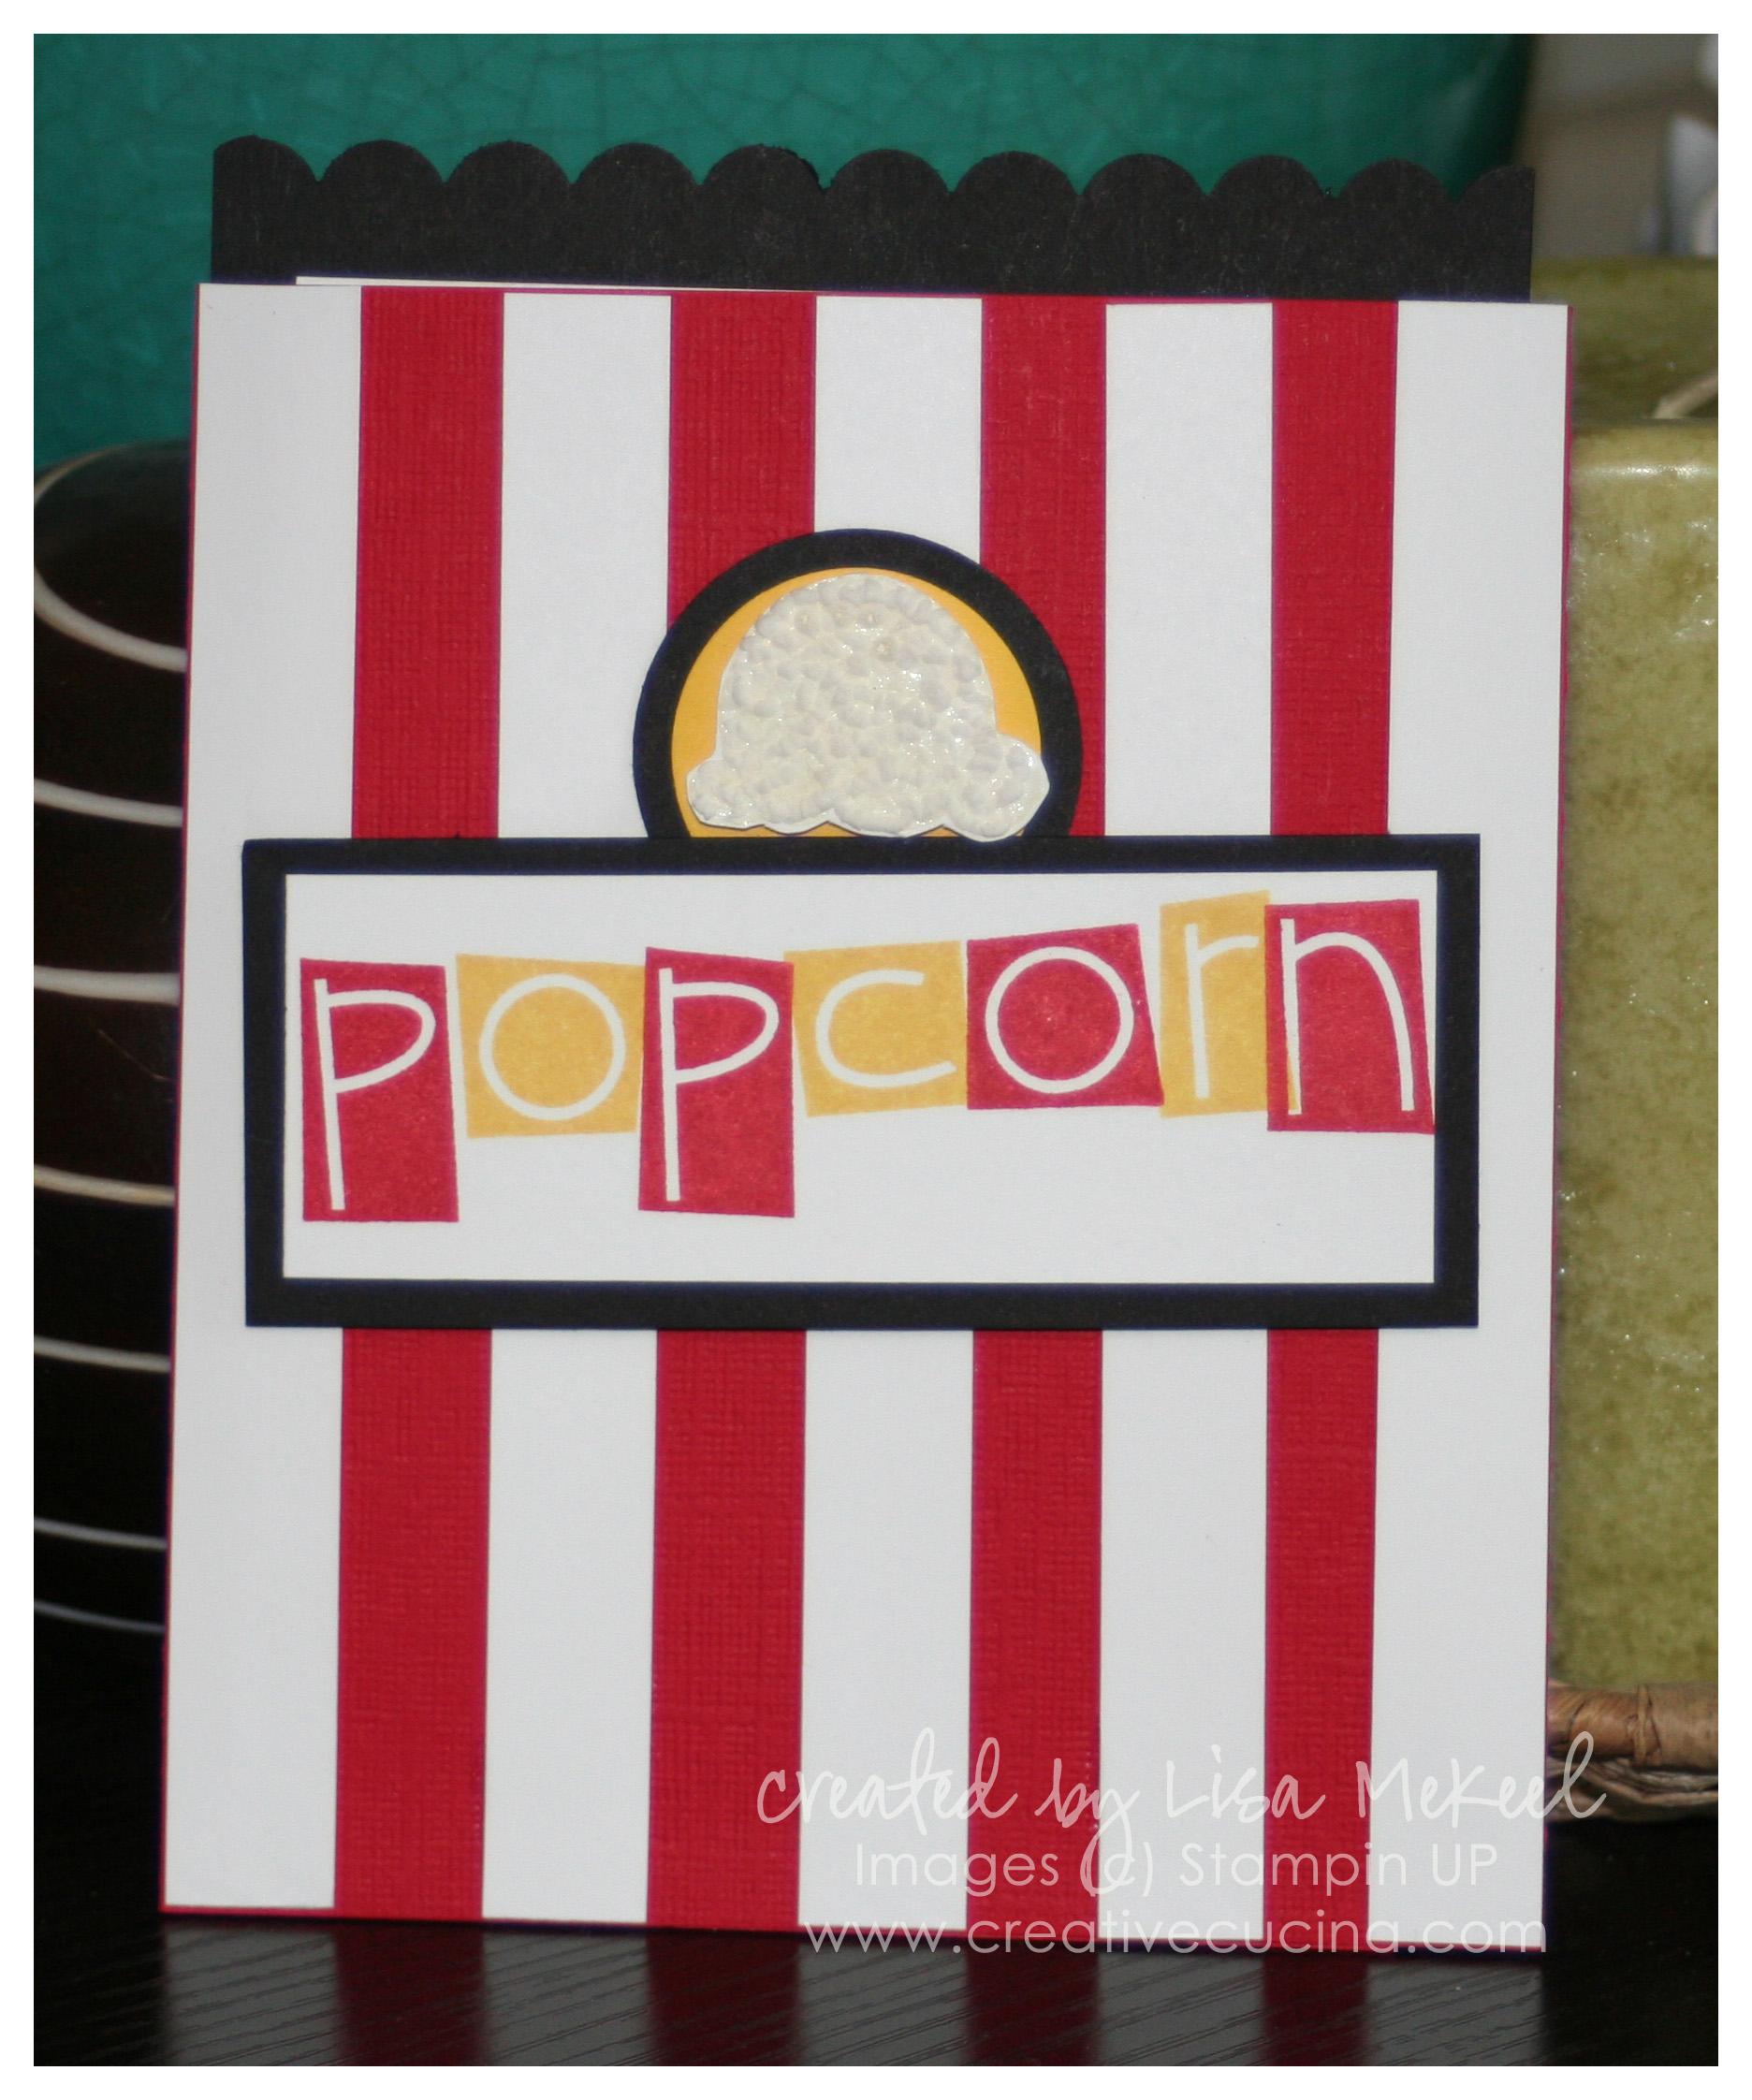 Popcorn Creative Cucina